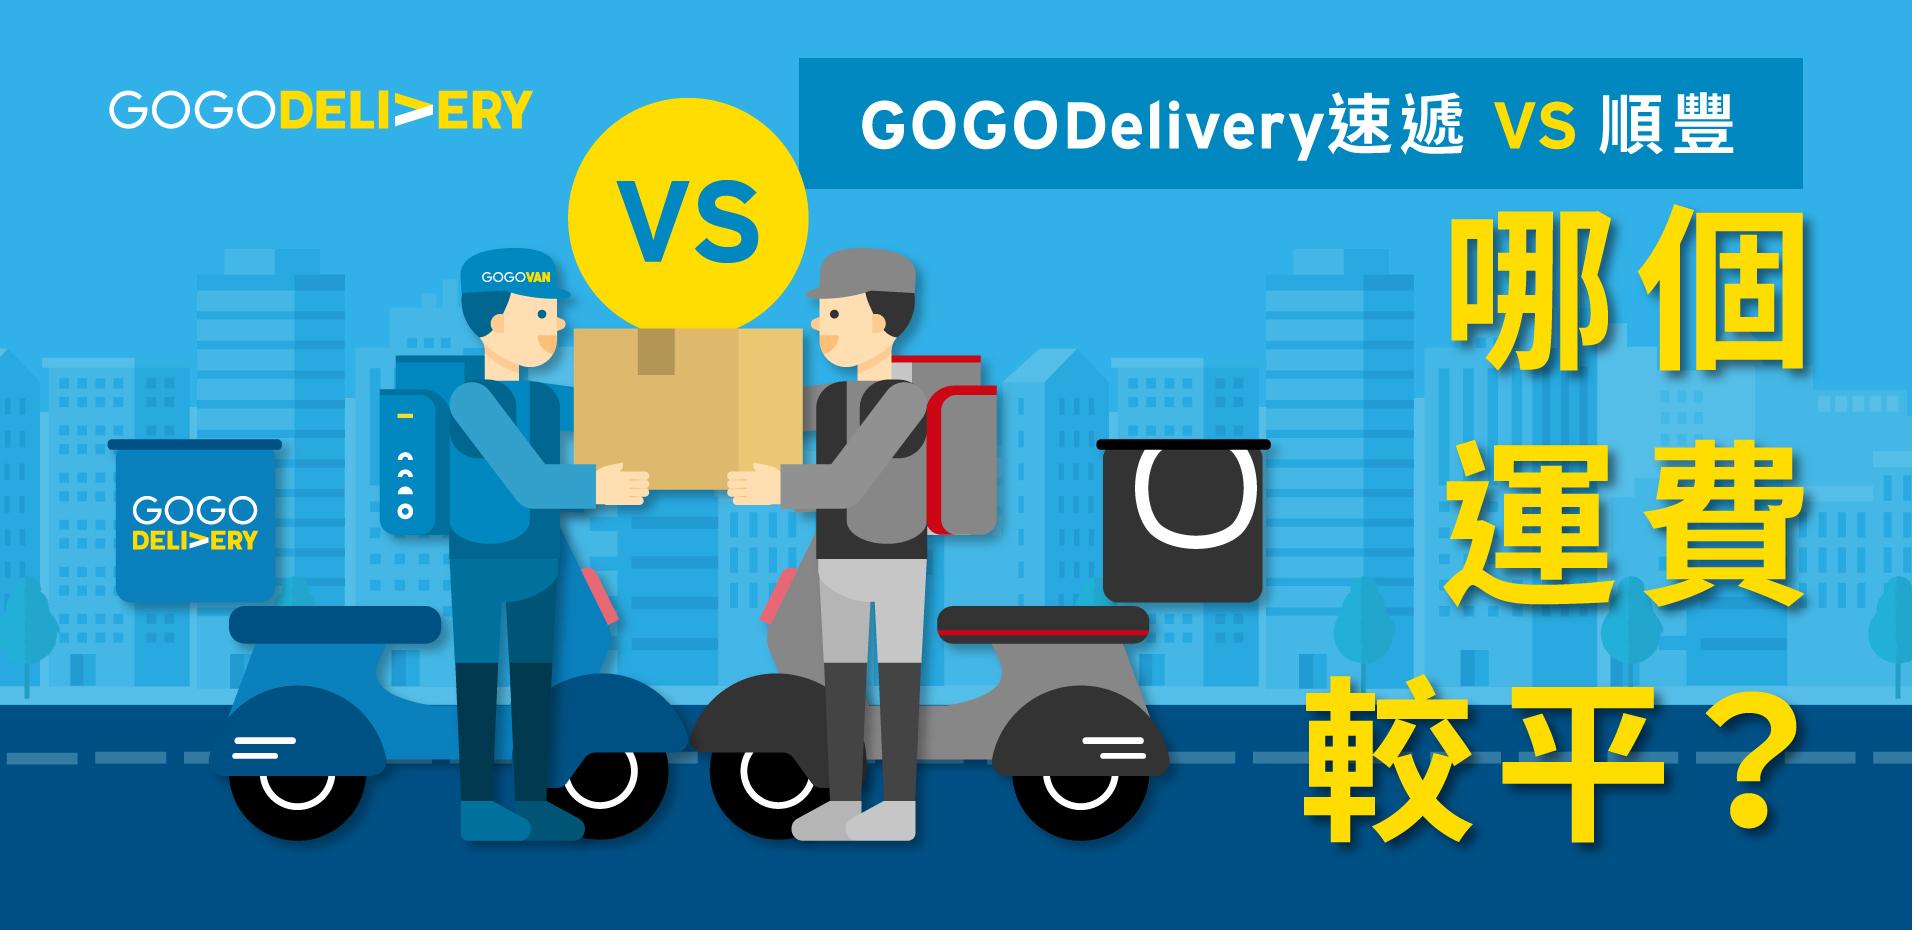 GOGODelivery速遞 vs 順豐: 哪個運費較平?